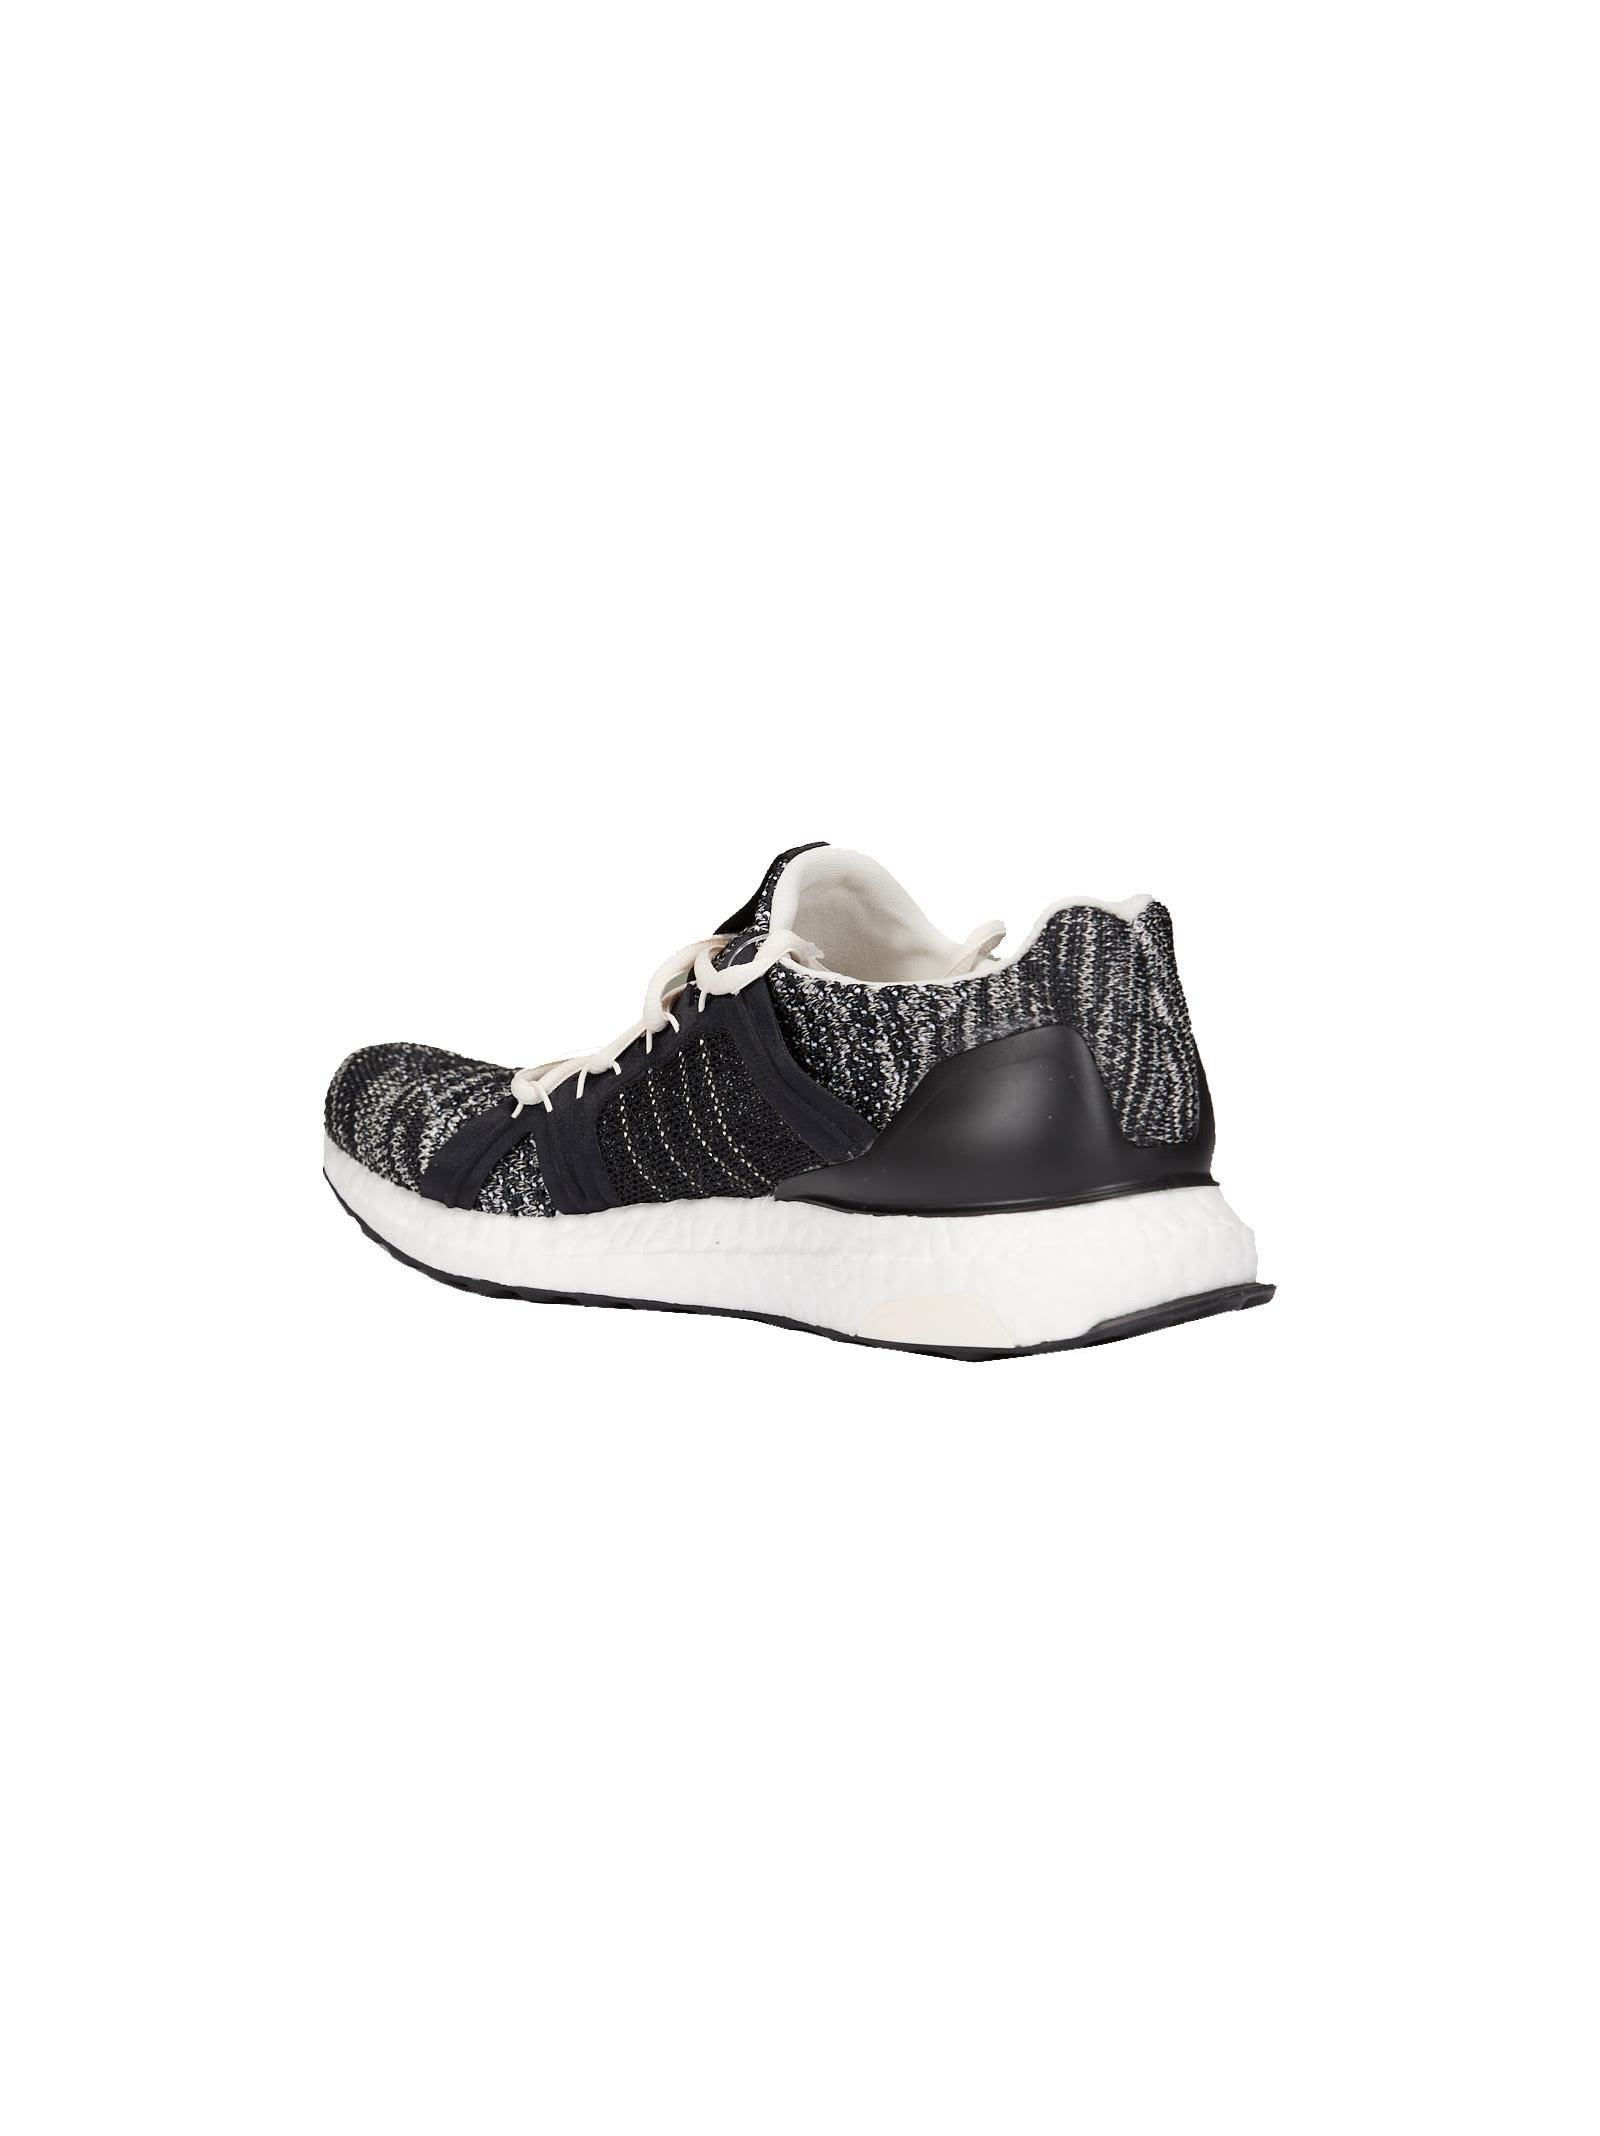 ... Adidas By Stella Mccartney Ultra Boost Parsley Sneakers